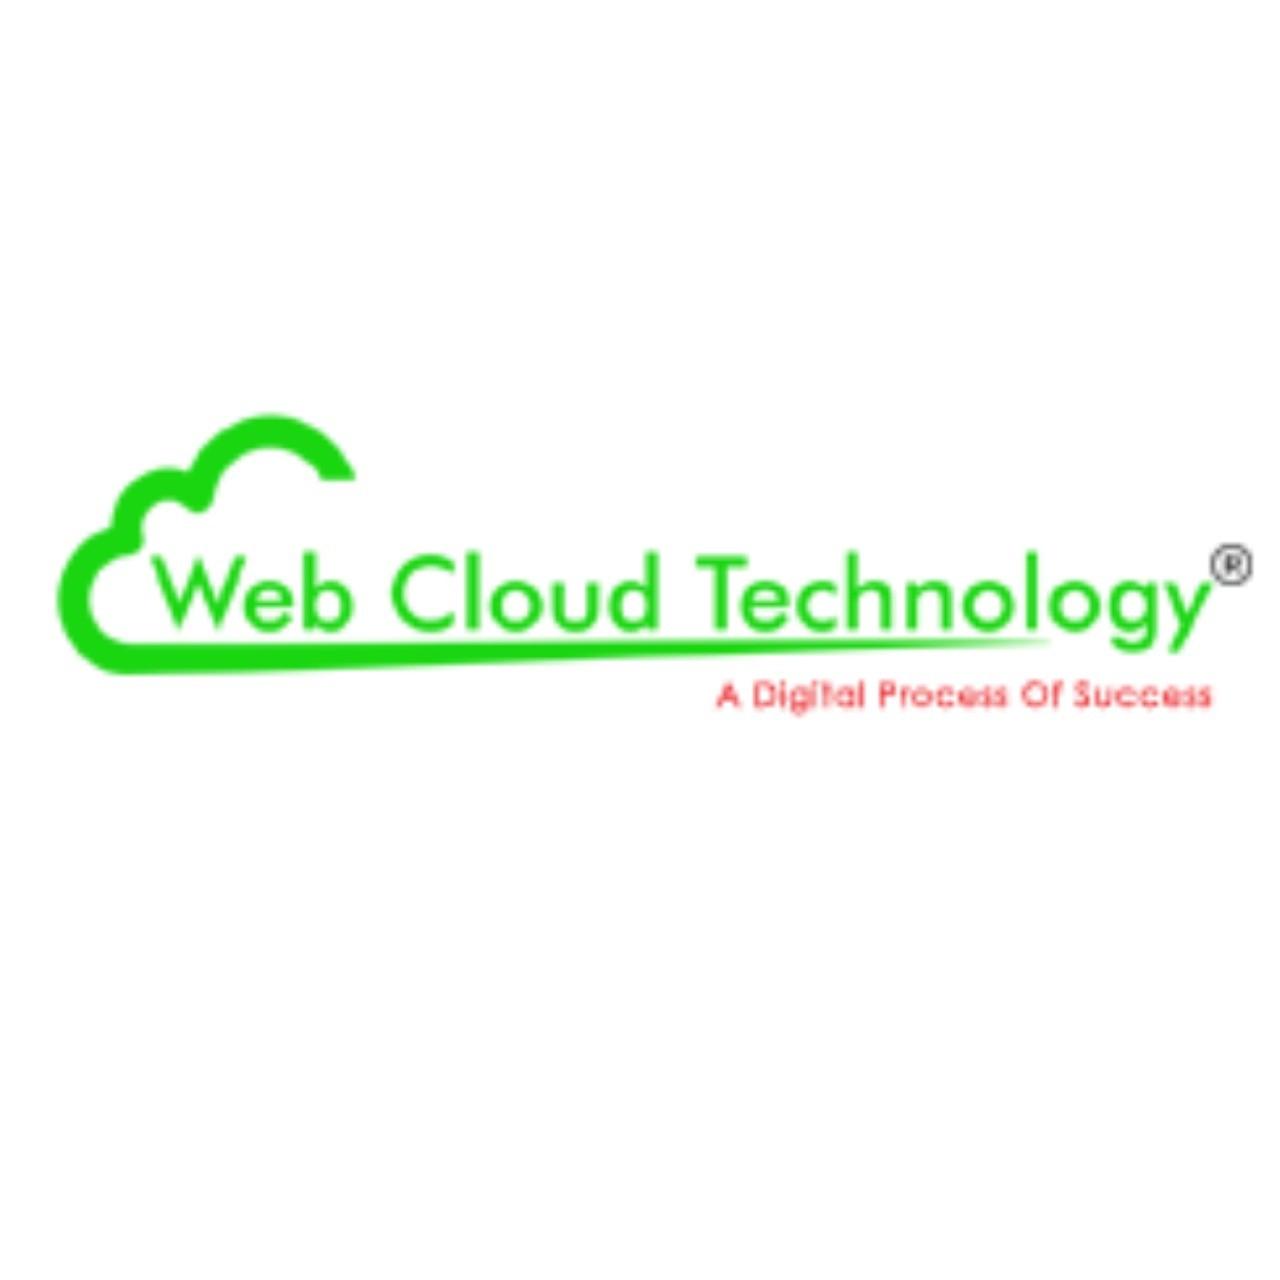 Web Cloud Technology